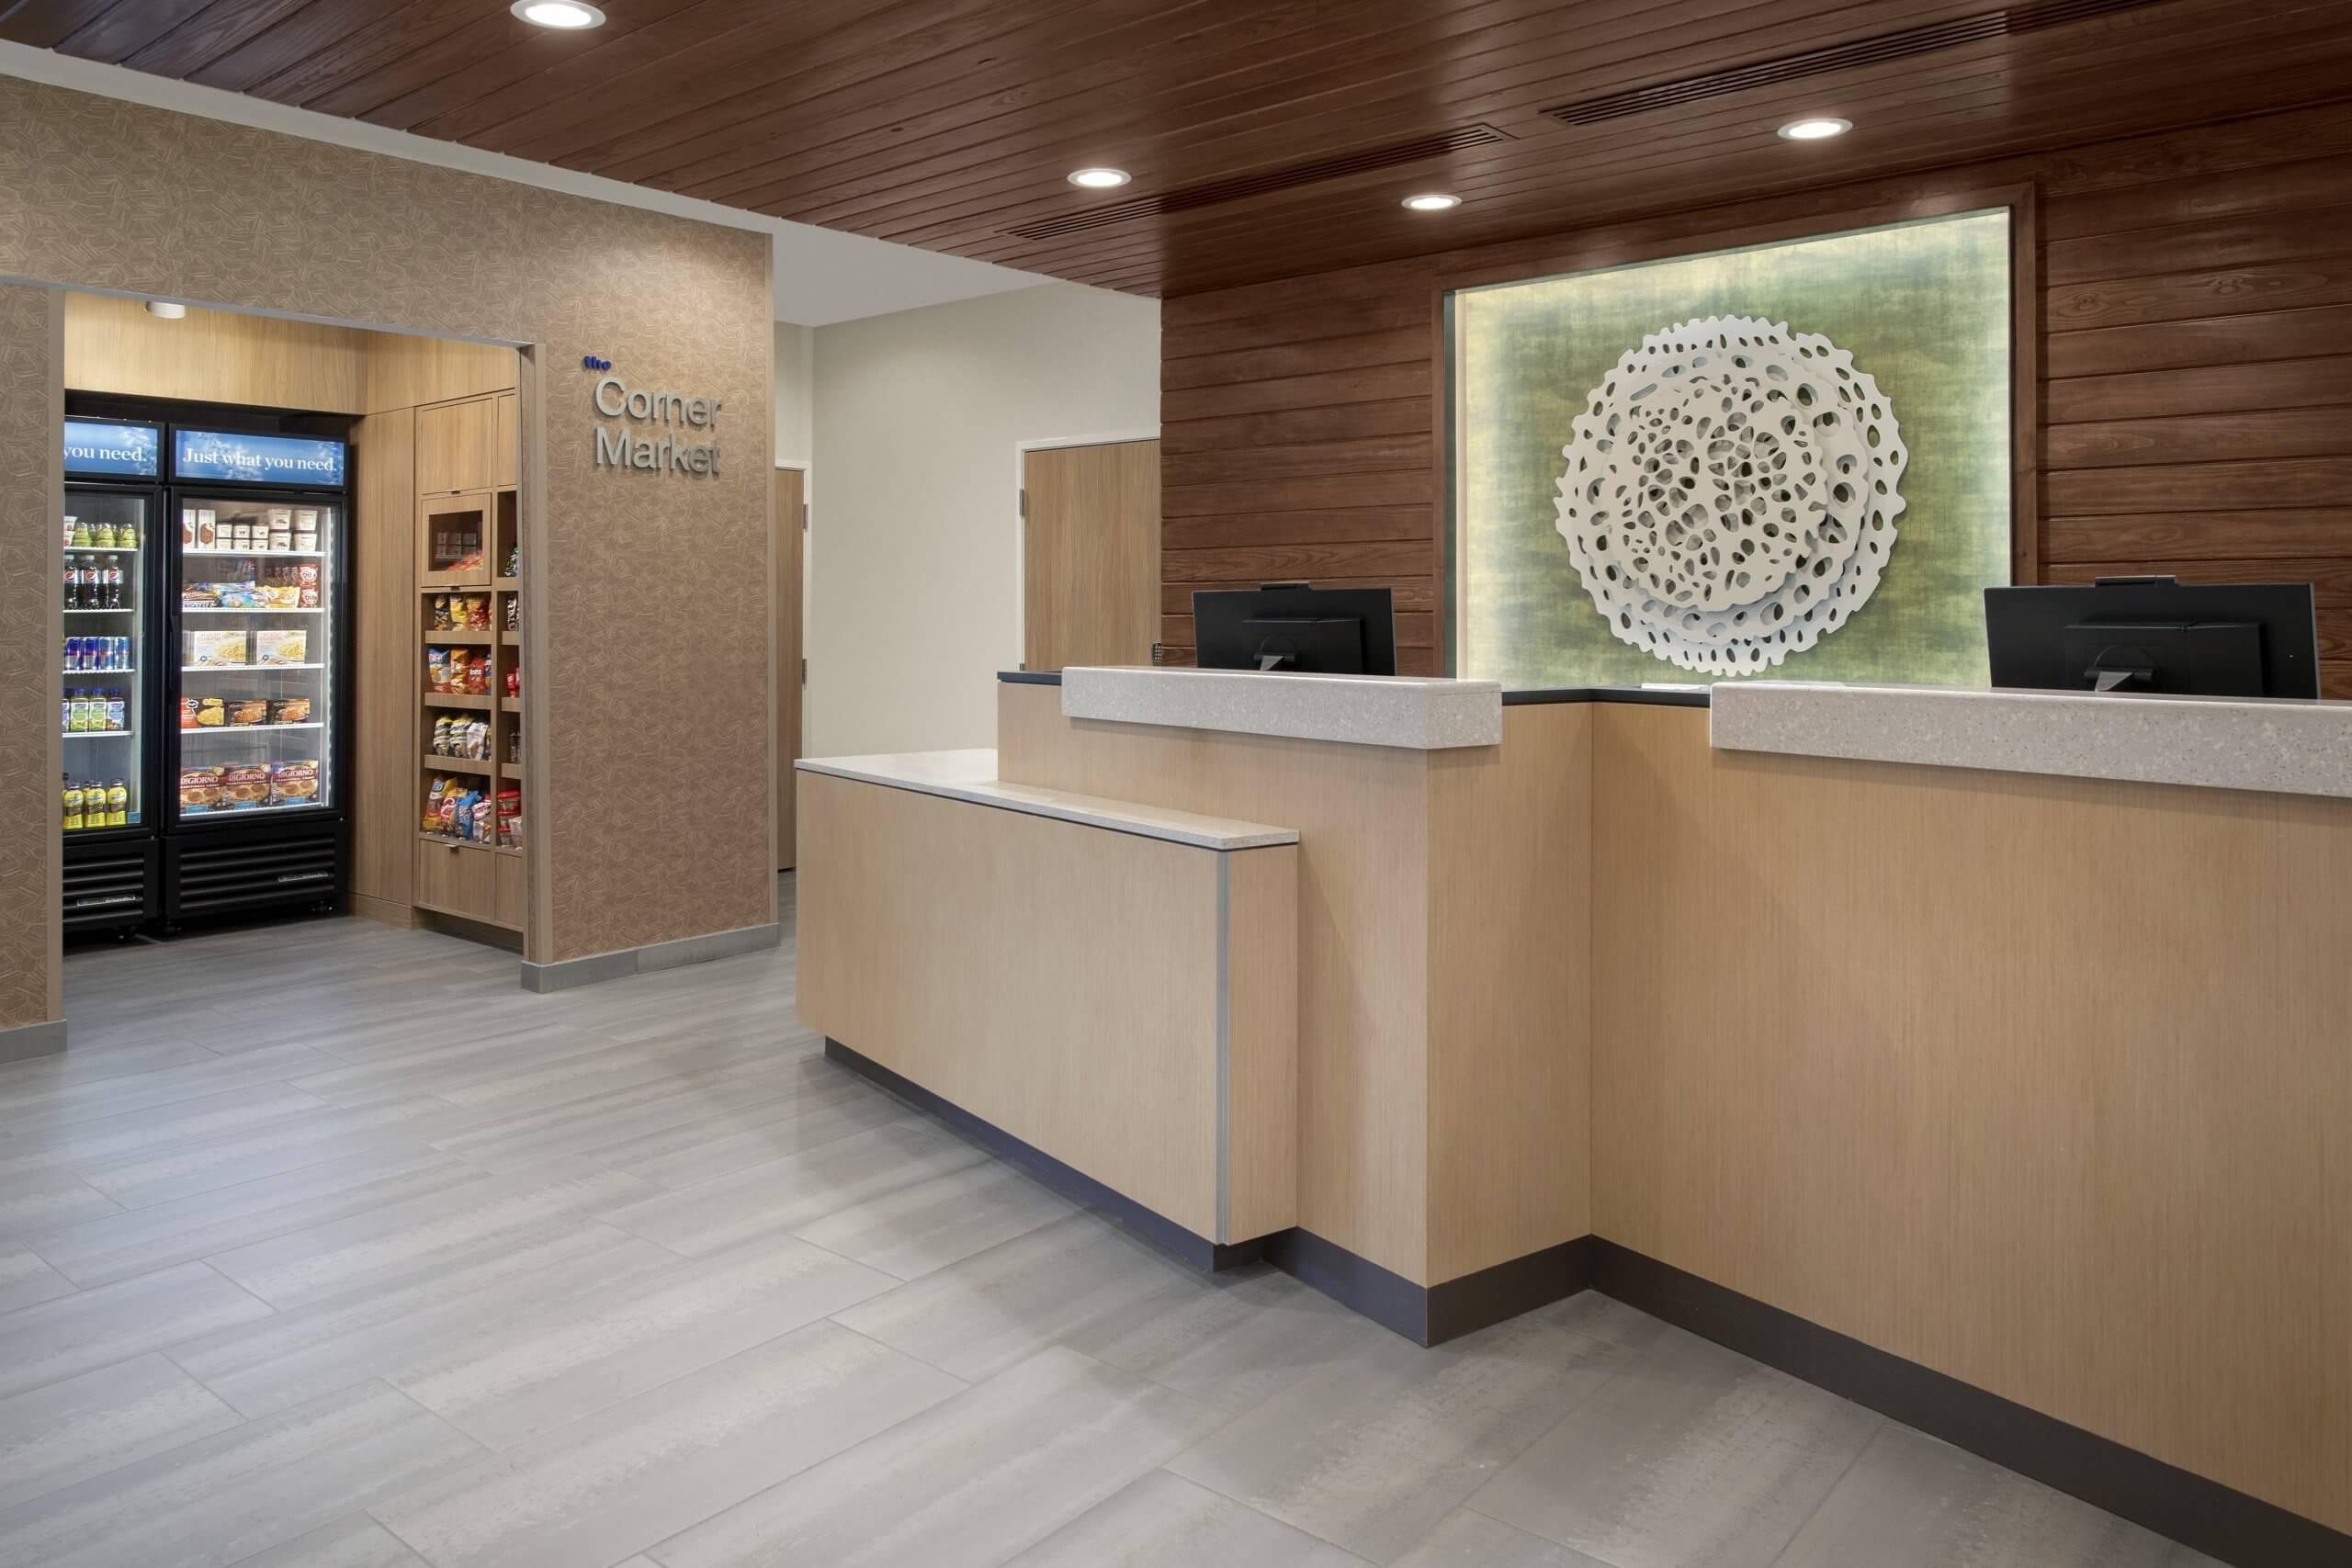 Fairfield Inn & Suites Denver Tech Center North